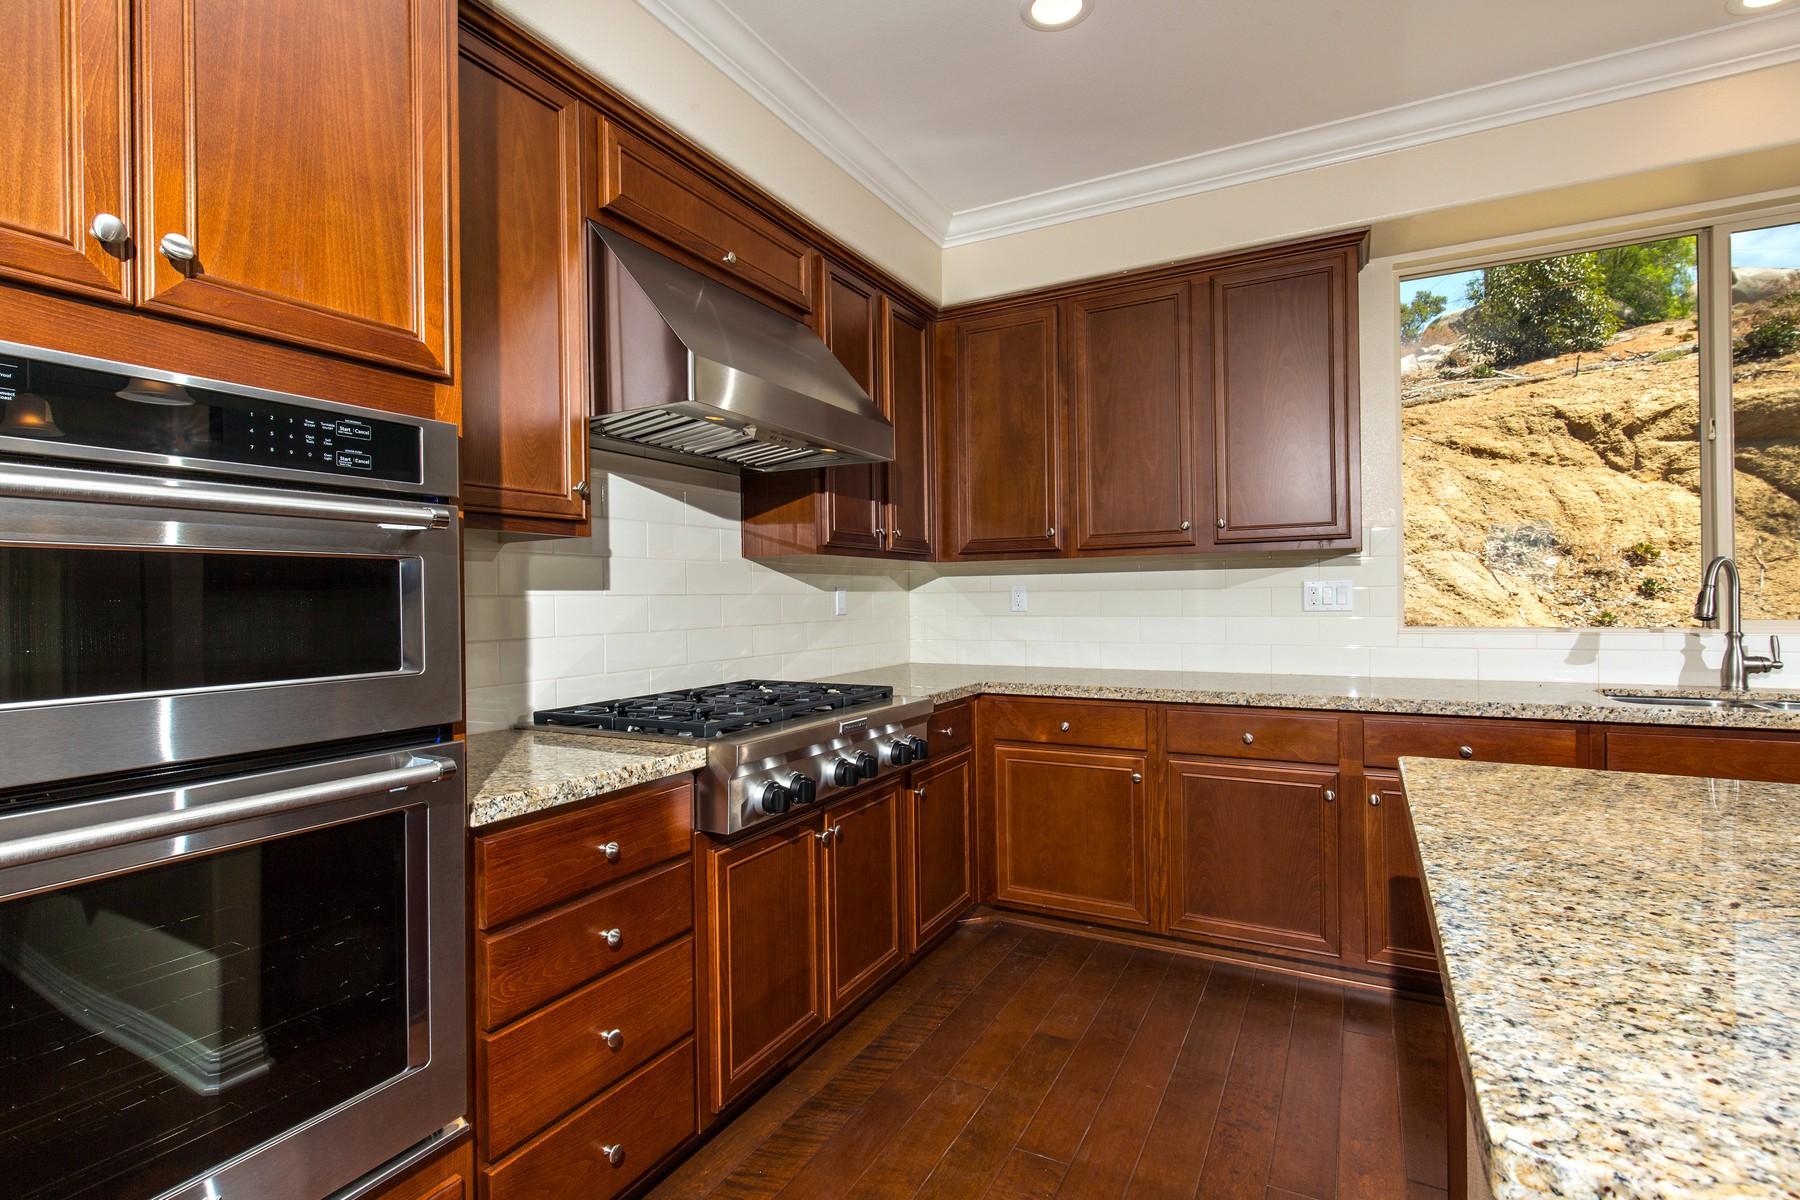 Additional photo for property listing at 2058 Ingamac Way  El Cajon, California 92019 Estados Unidos